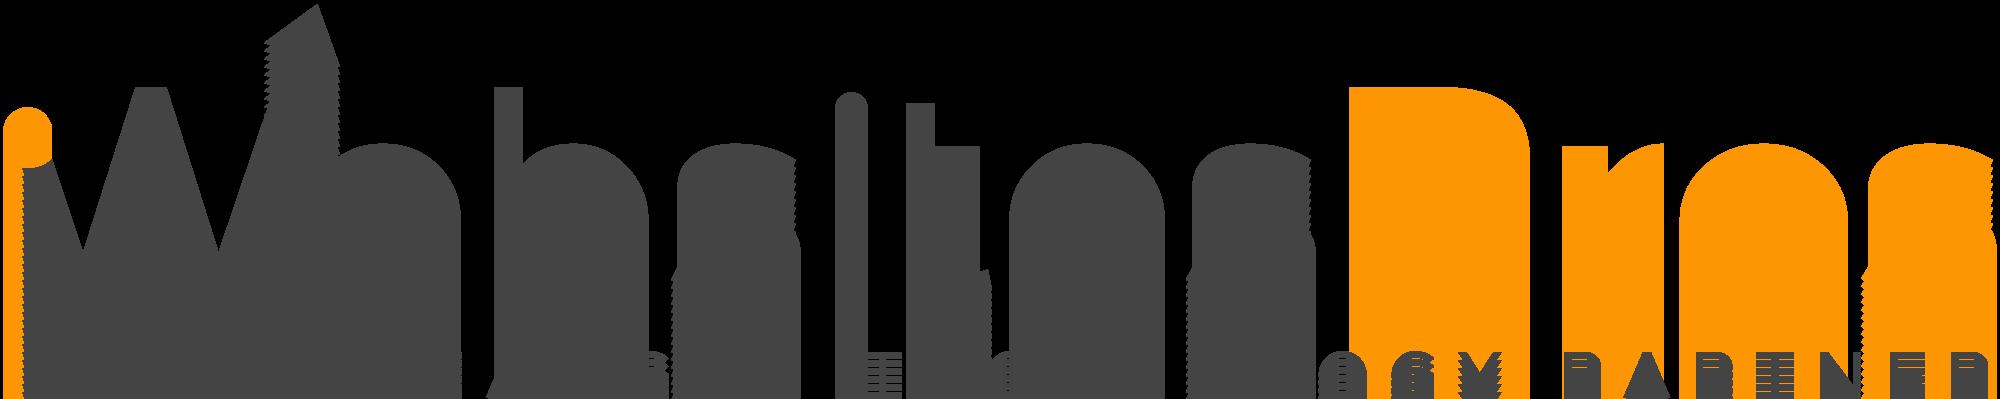 WebsitesPros Logo